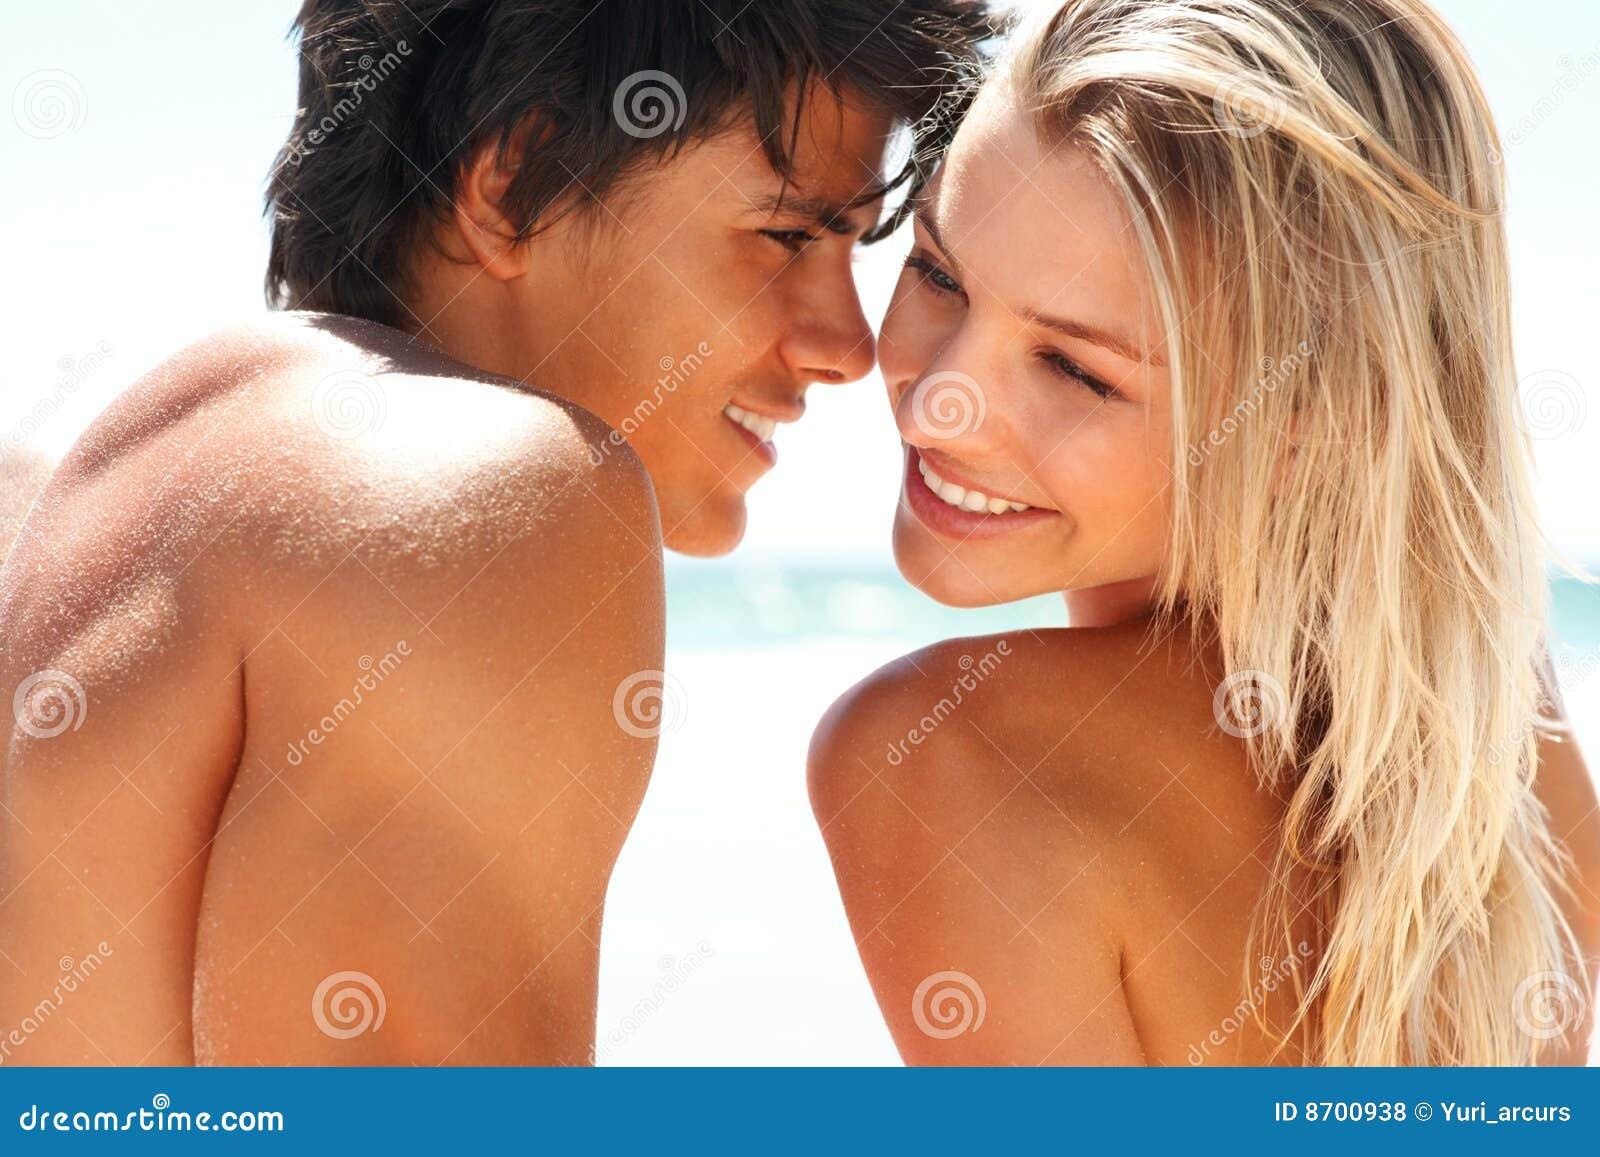 luchshie-komplimenti-devushke-o-ee-seksualnosti